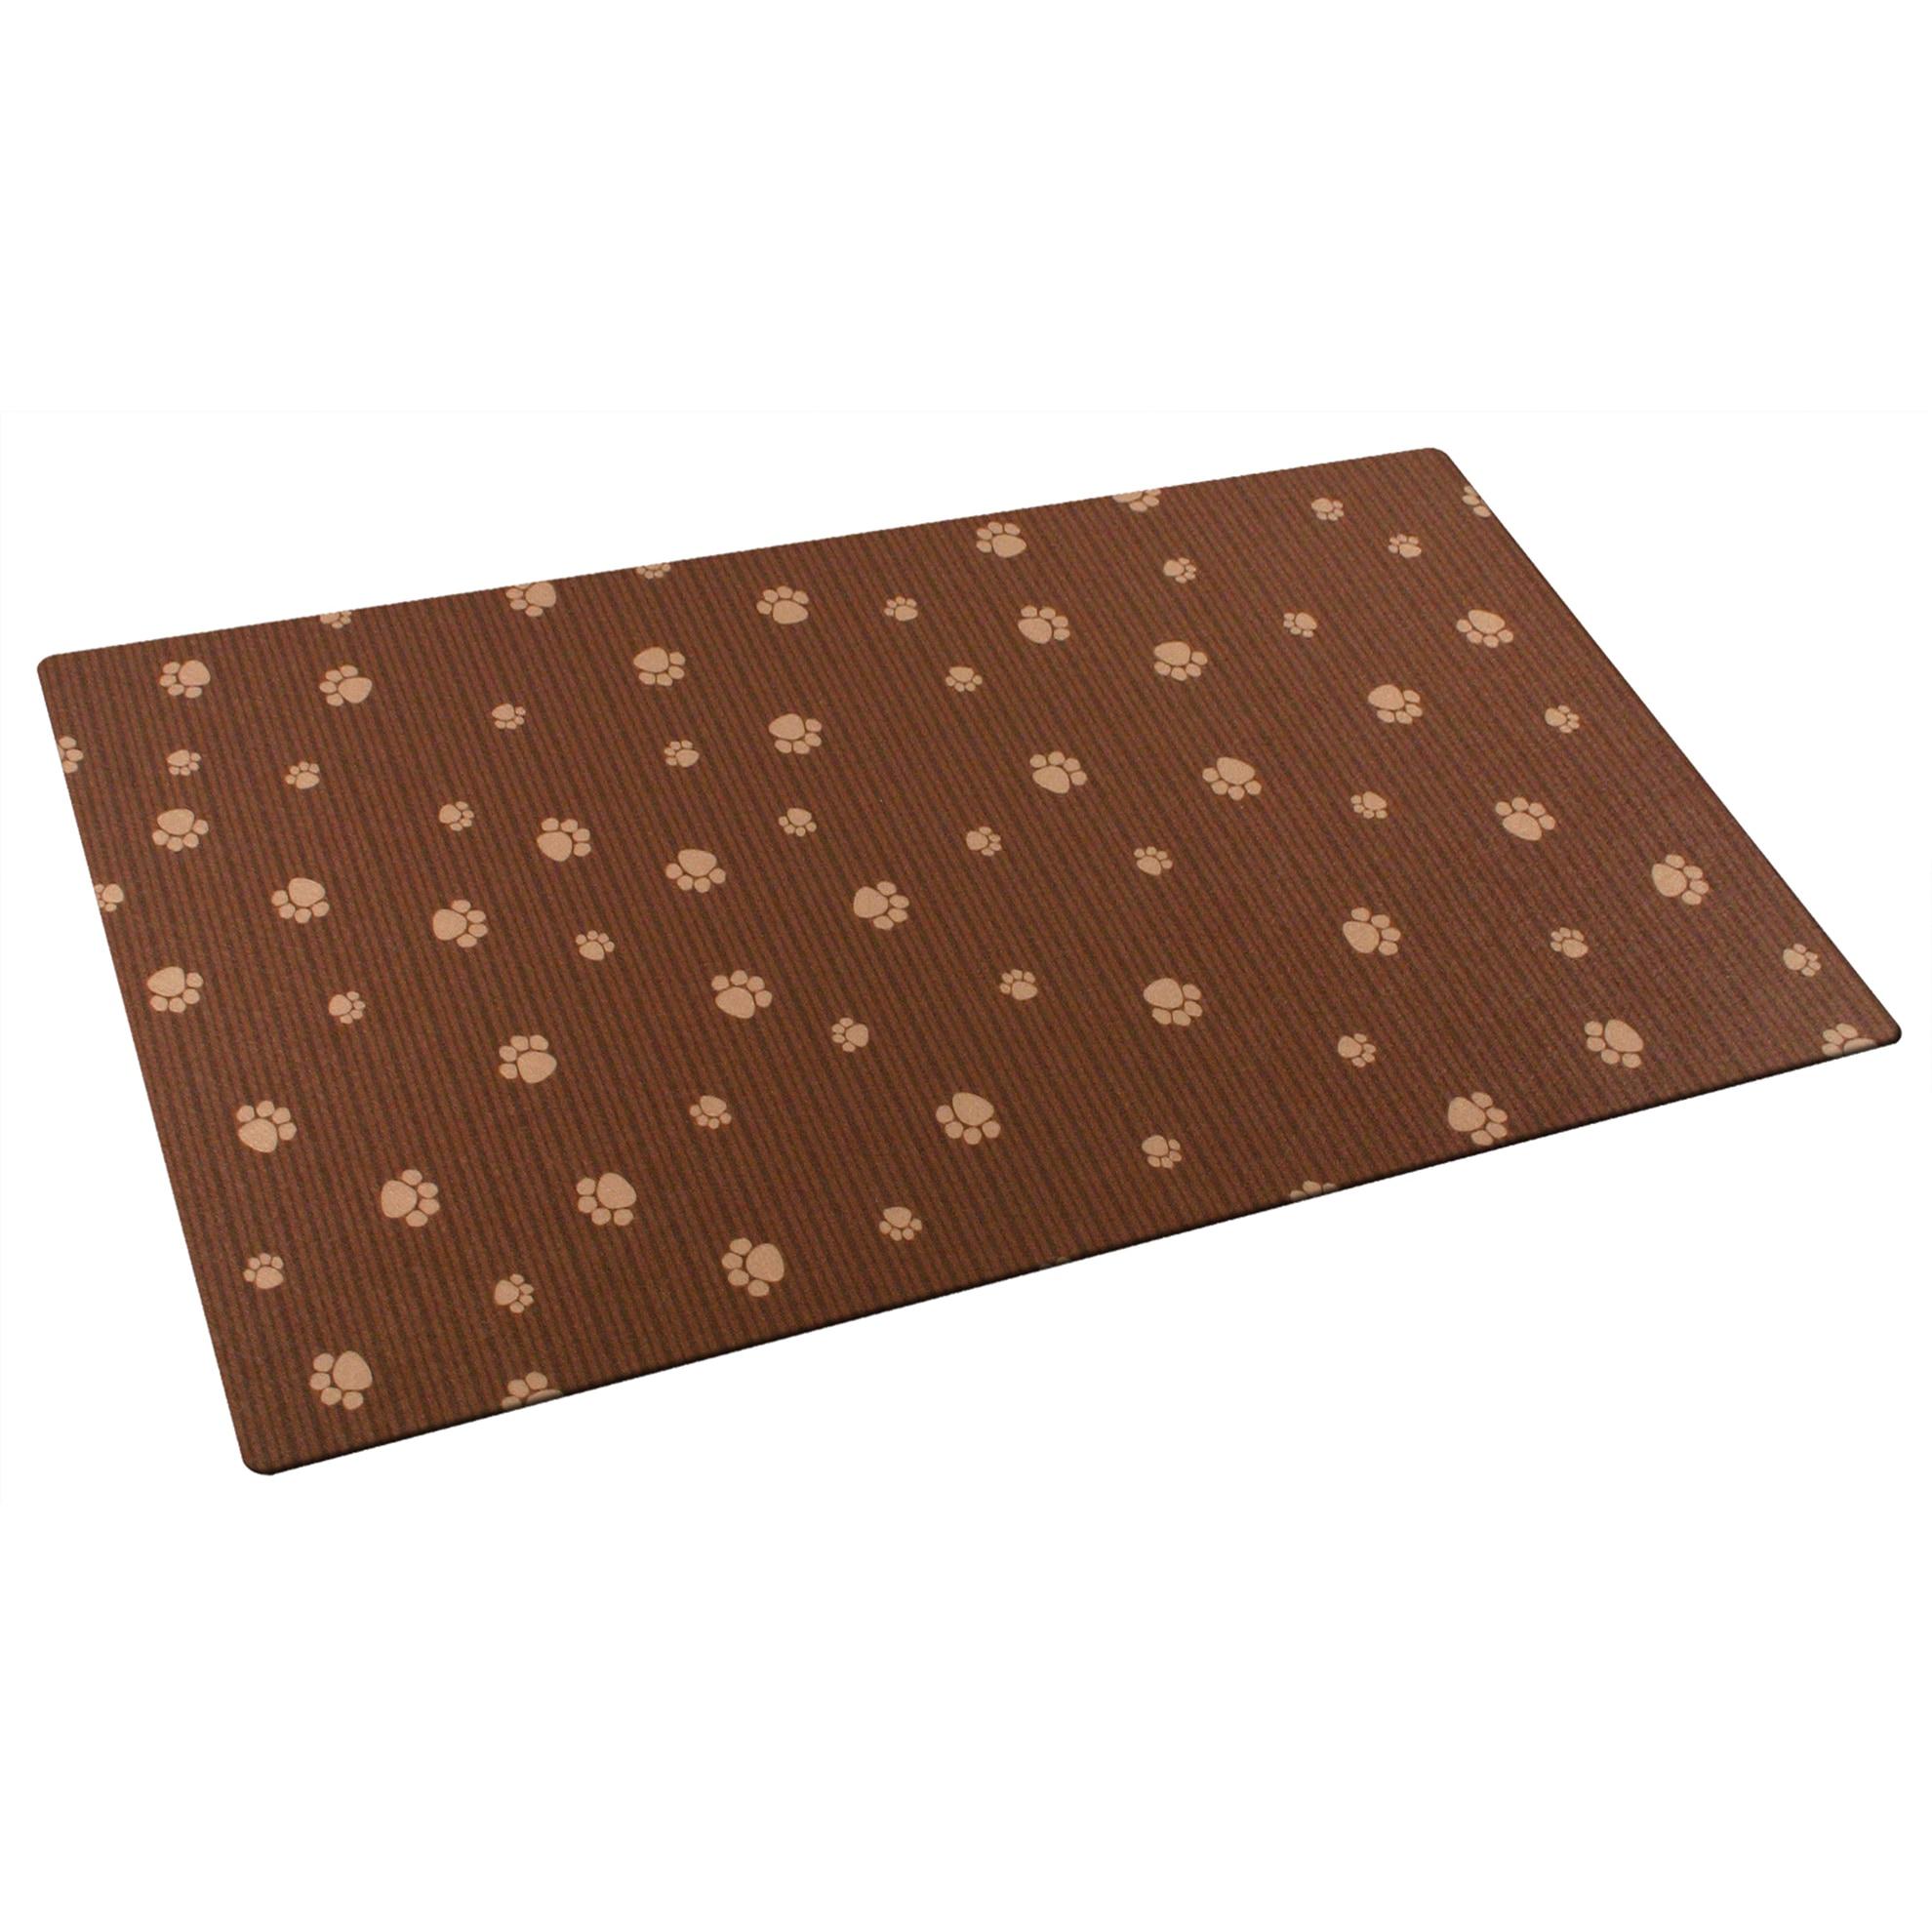 "Drymate PP1220BNSTP 12"" X 20"" Brown & Tan Pet Place Mat (..."